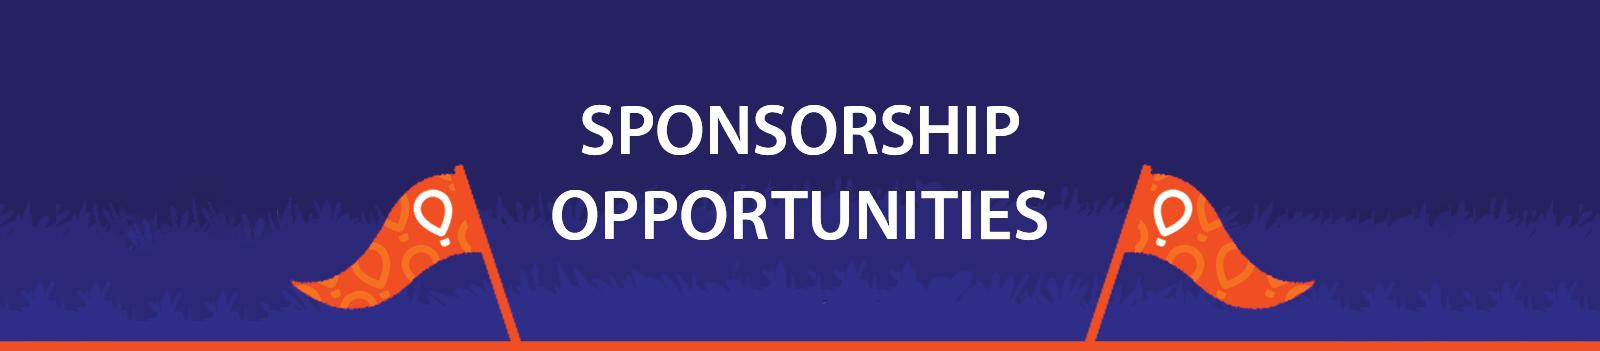 UF Health Gridiron Challenge Sponsorship Opportunities header image